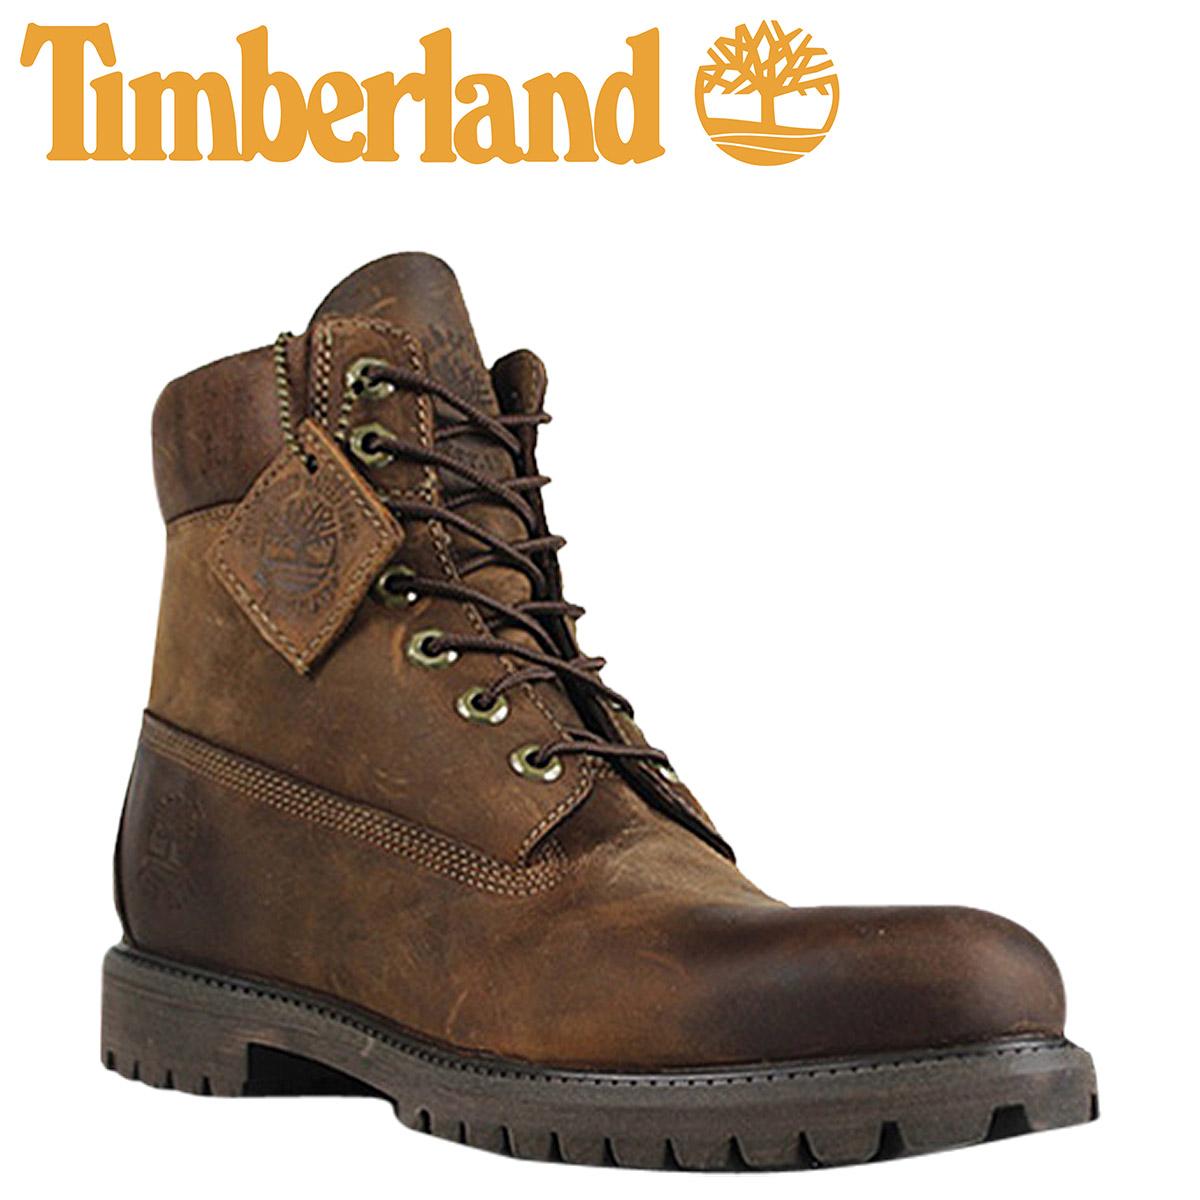 6 inch timberland heritage